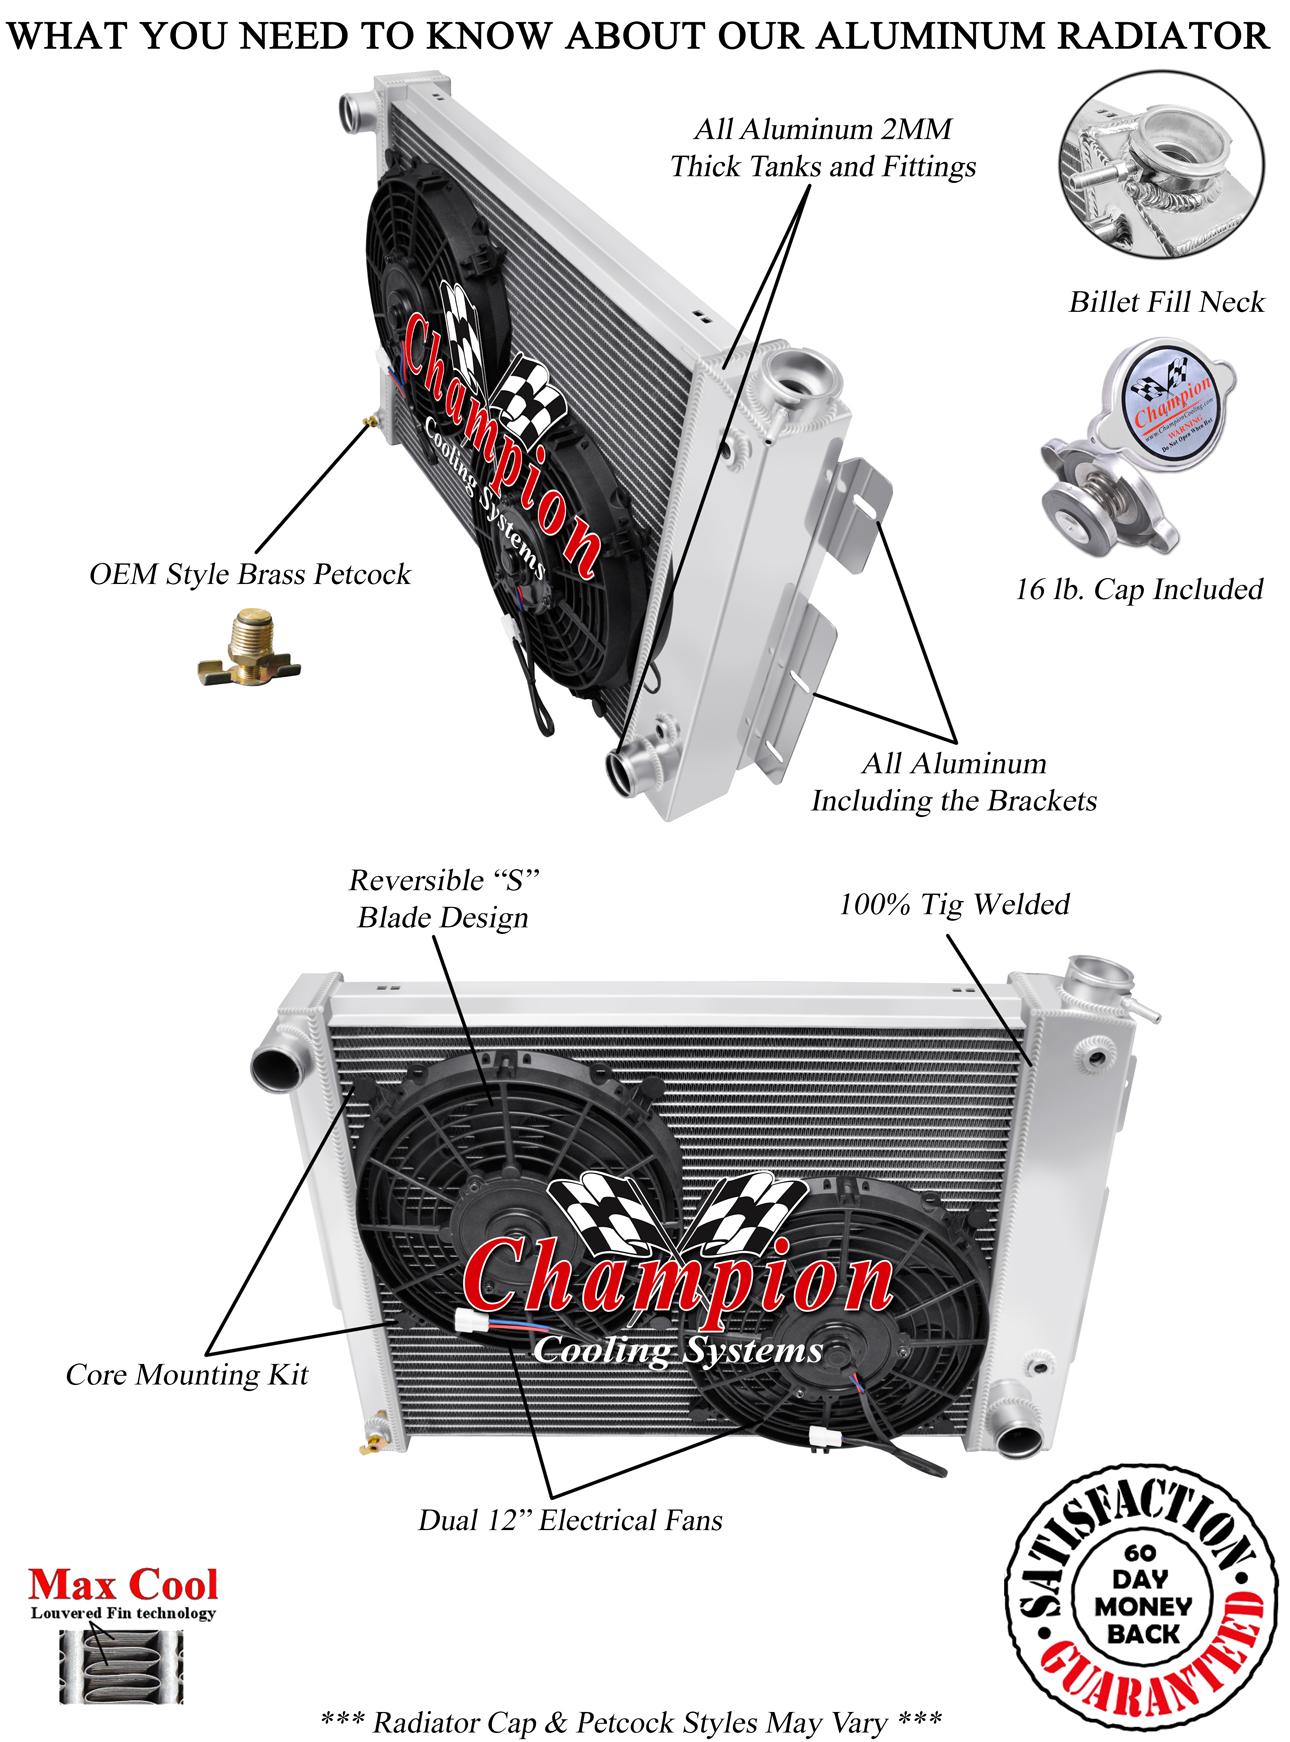 1967-1969 Camaro Small Block All Alum 3 Row KR Champion Radiator Fan Combo